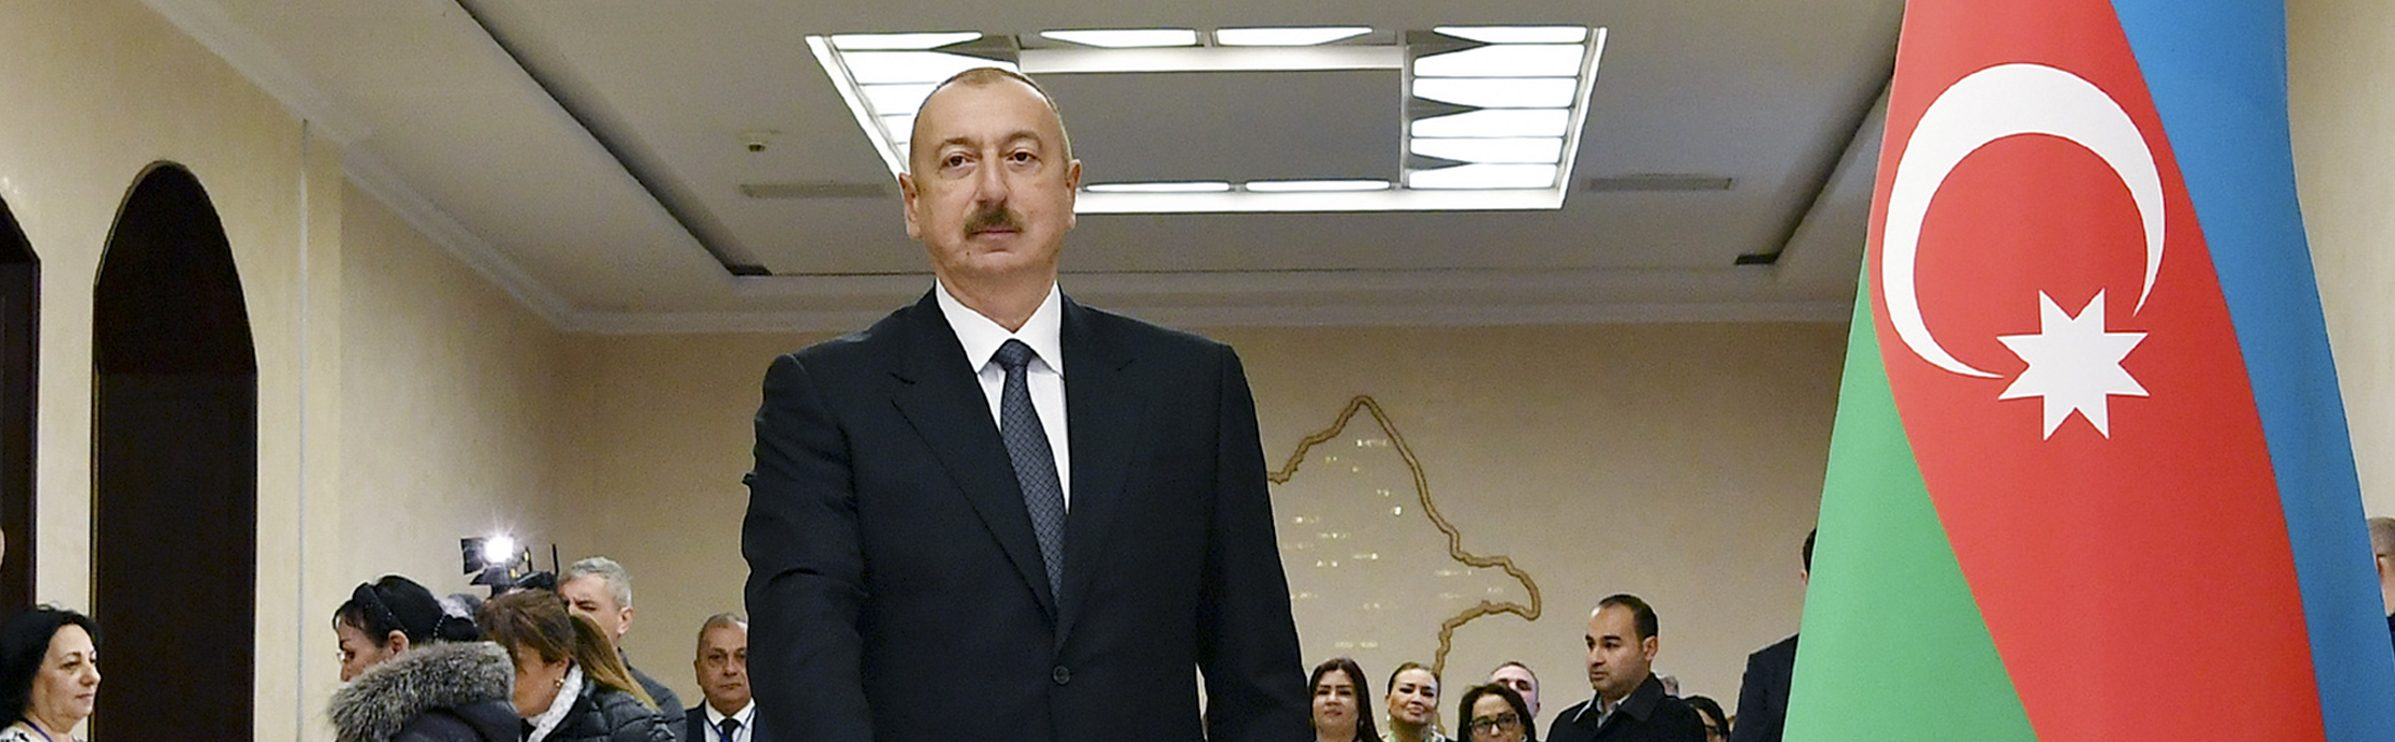 Chi è Ilham Aliyev